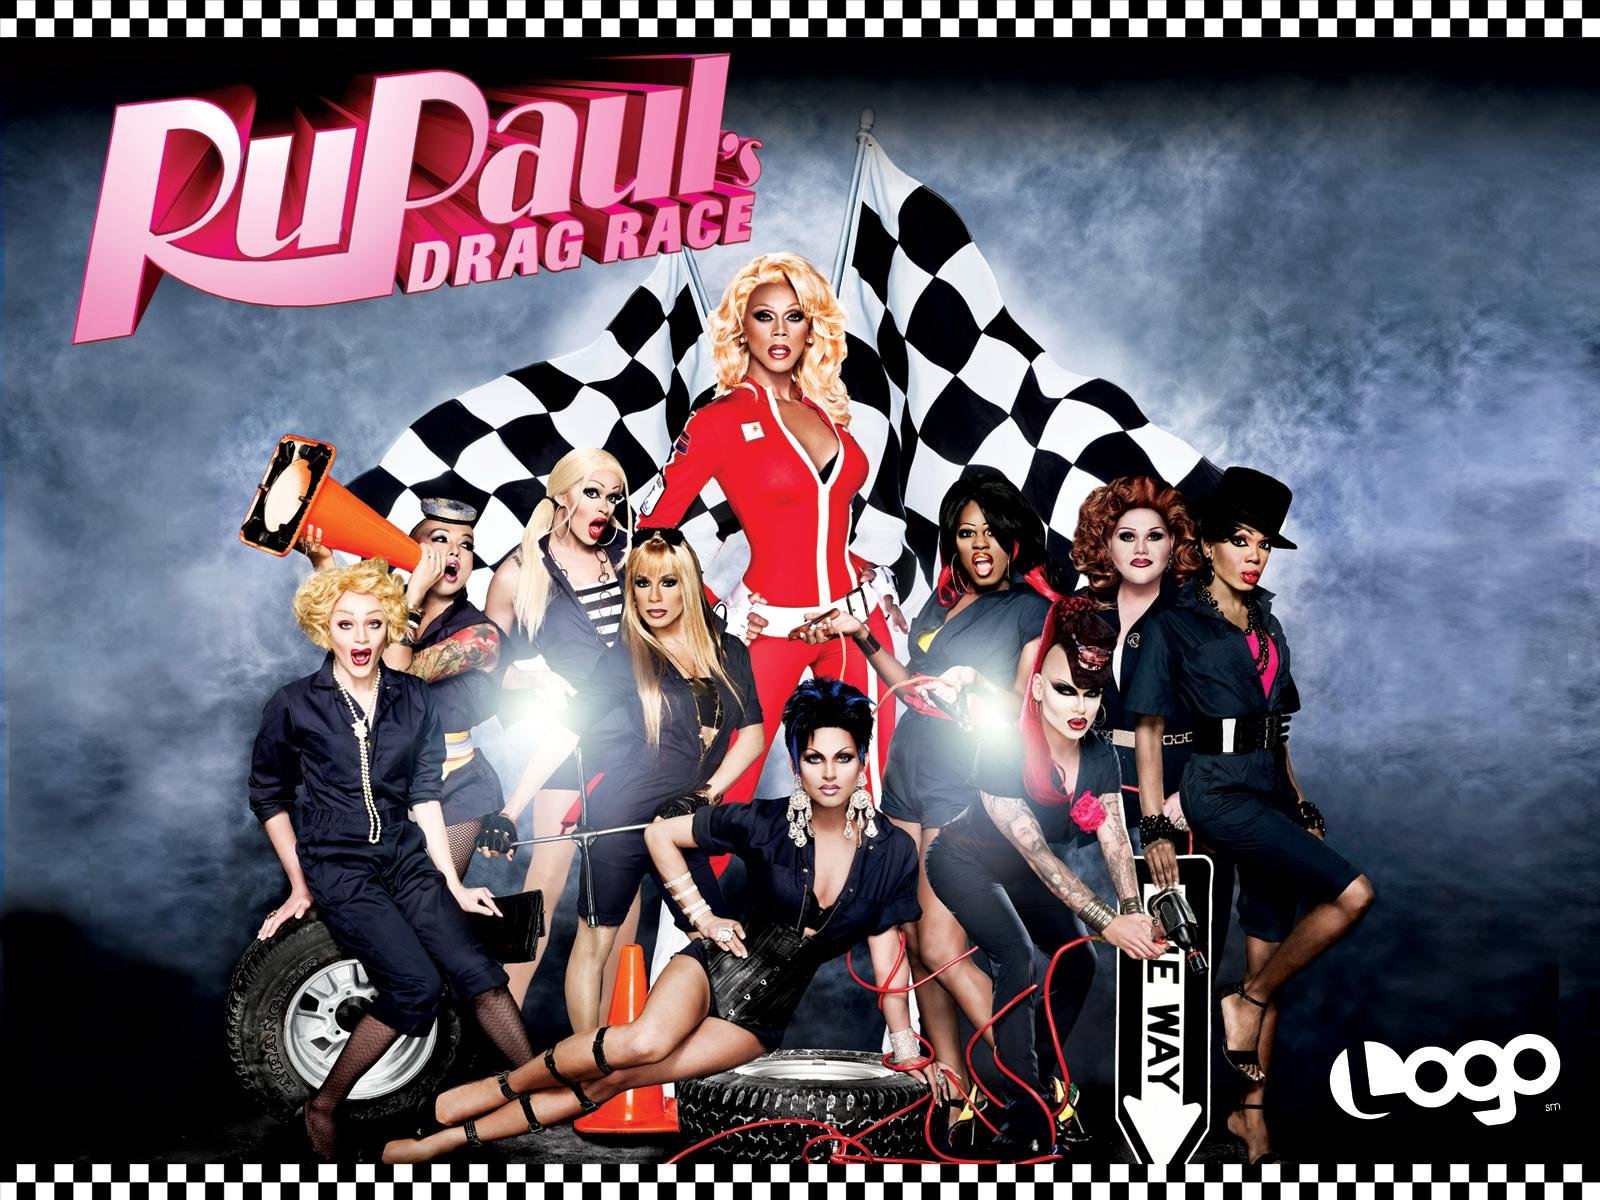 Watch Rupauls Drag Race Season 1 Prime Video